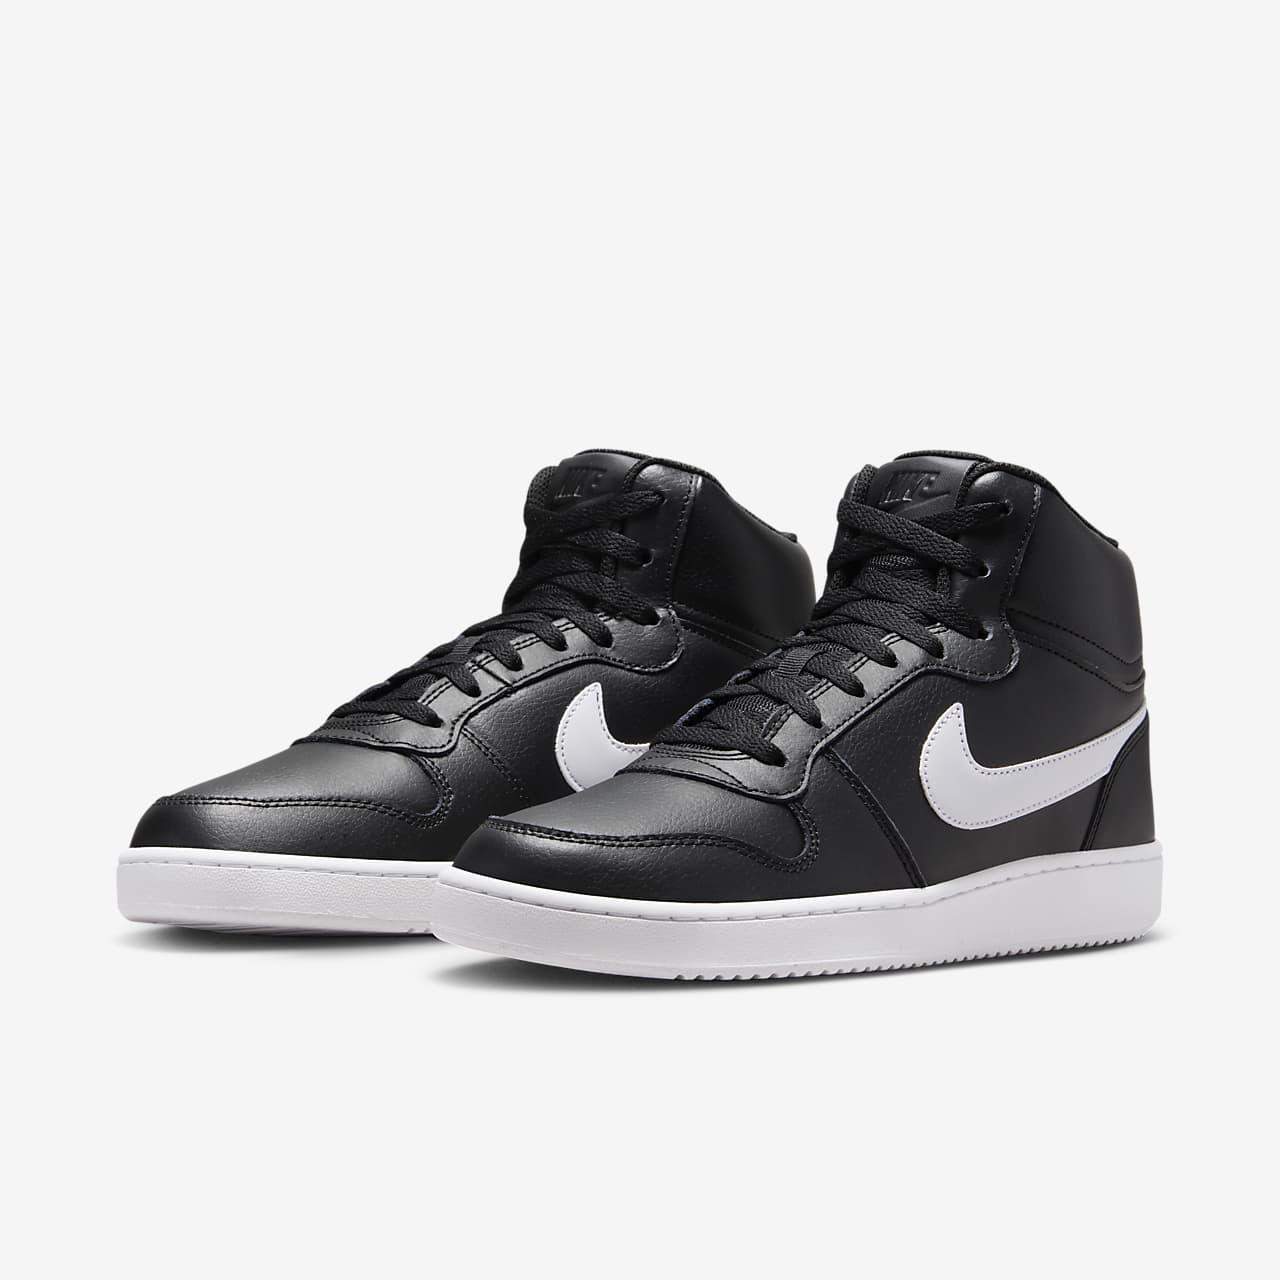 new style 116f8 3ec58 ... Nike Ebernon Mid-sko til mænd